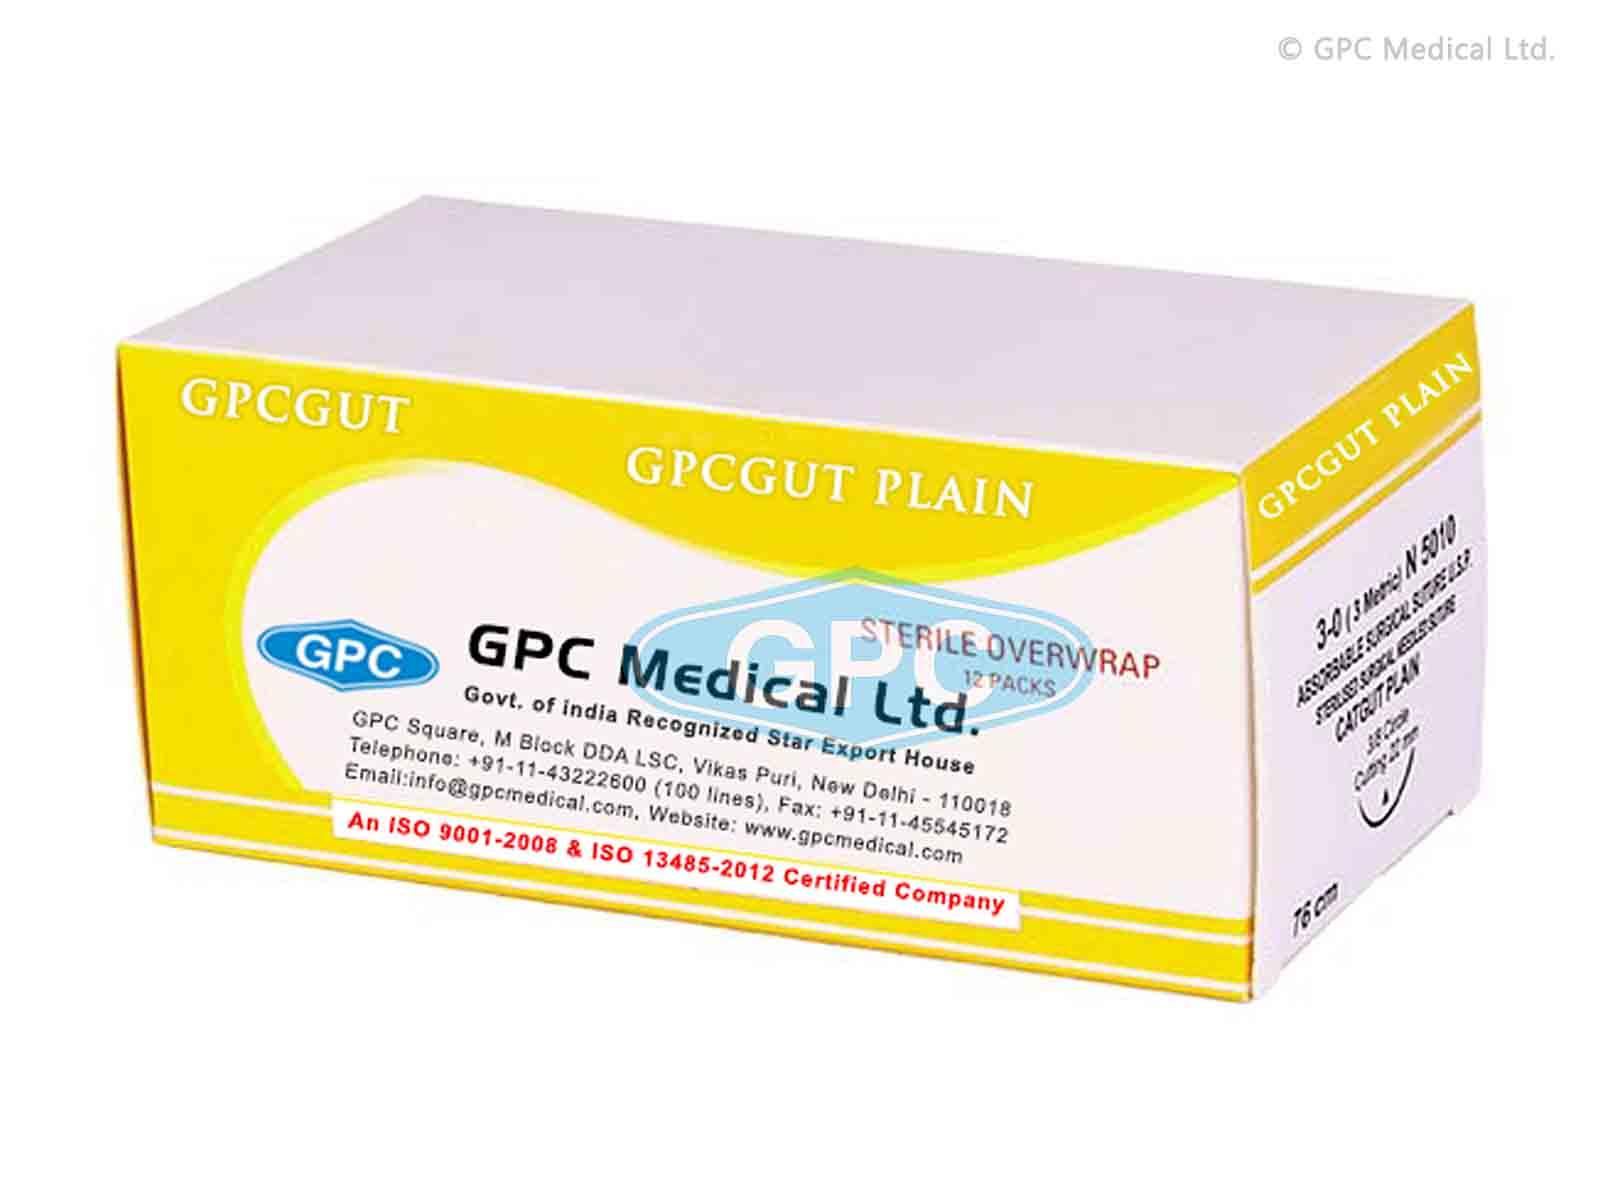 GPCGUT PLAIN - Catgut Plain